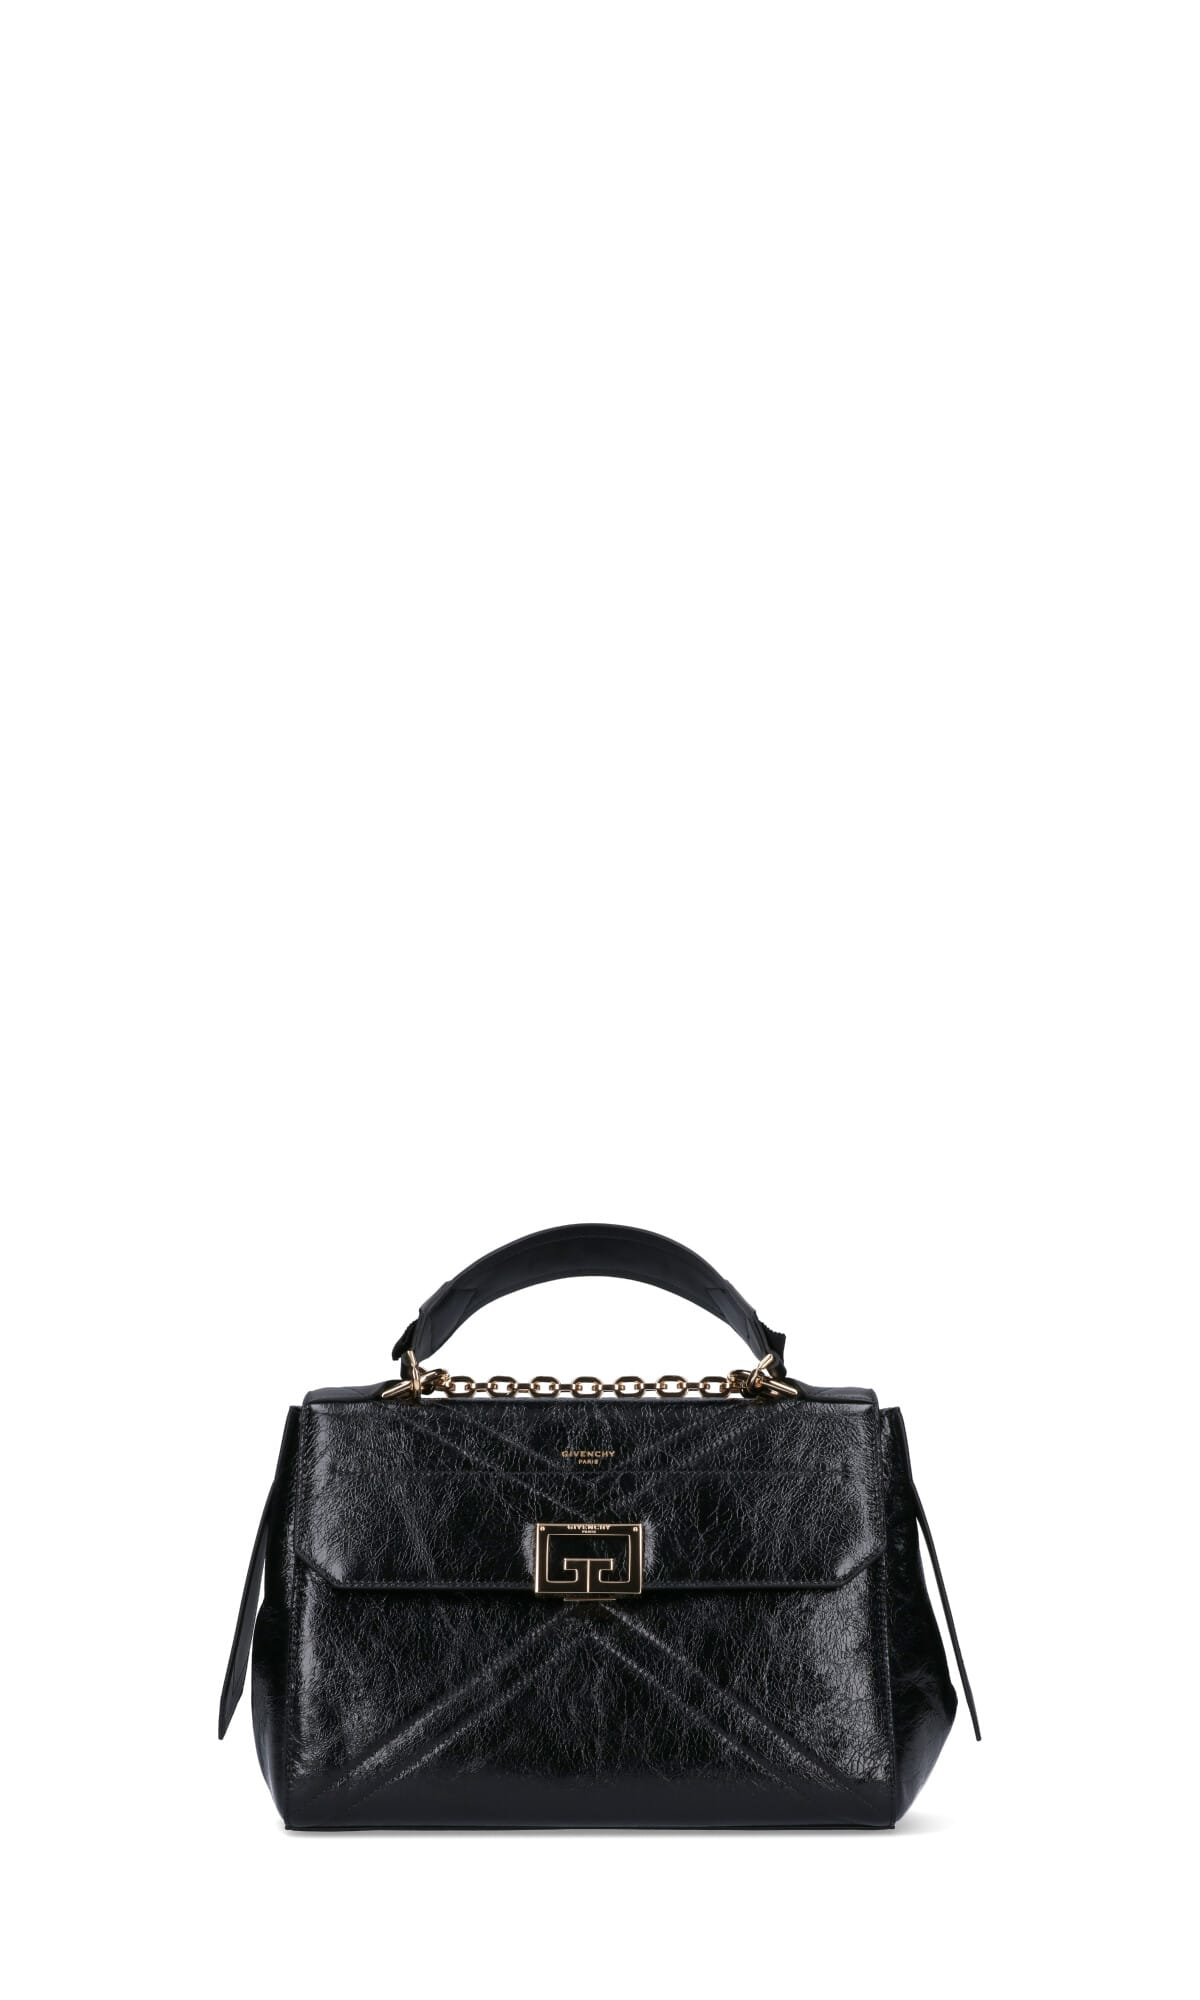 Id Top Handle Bag